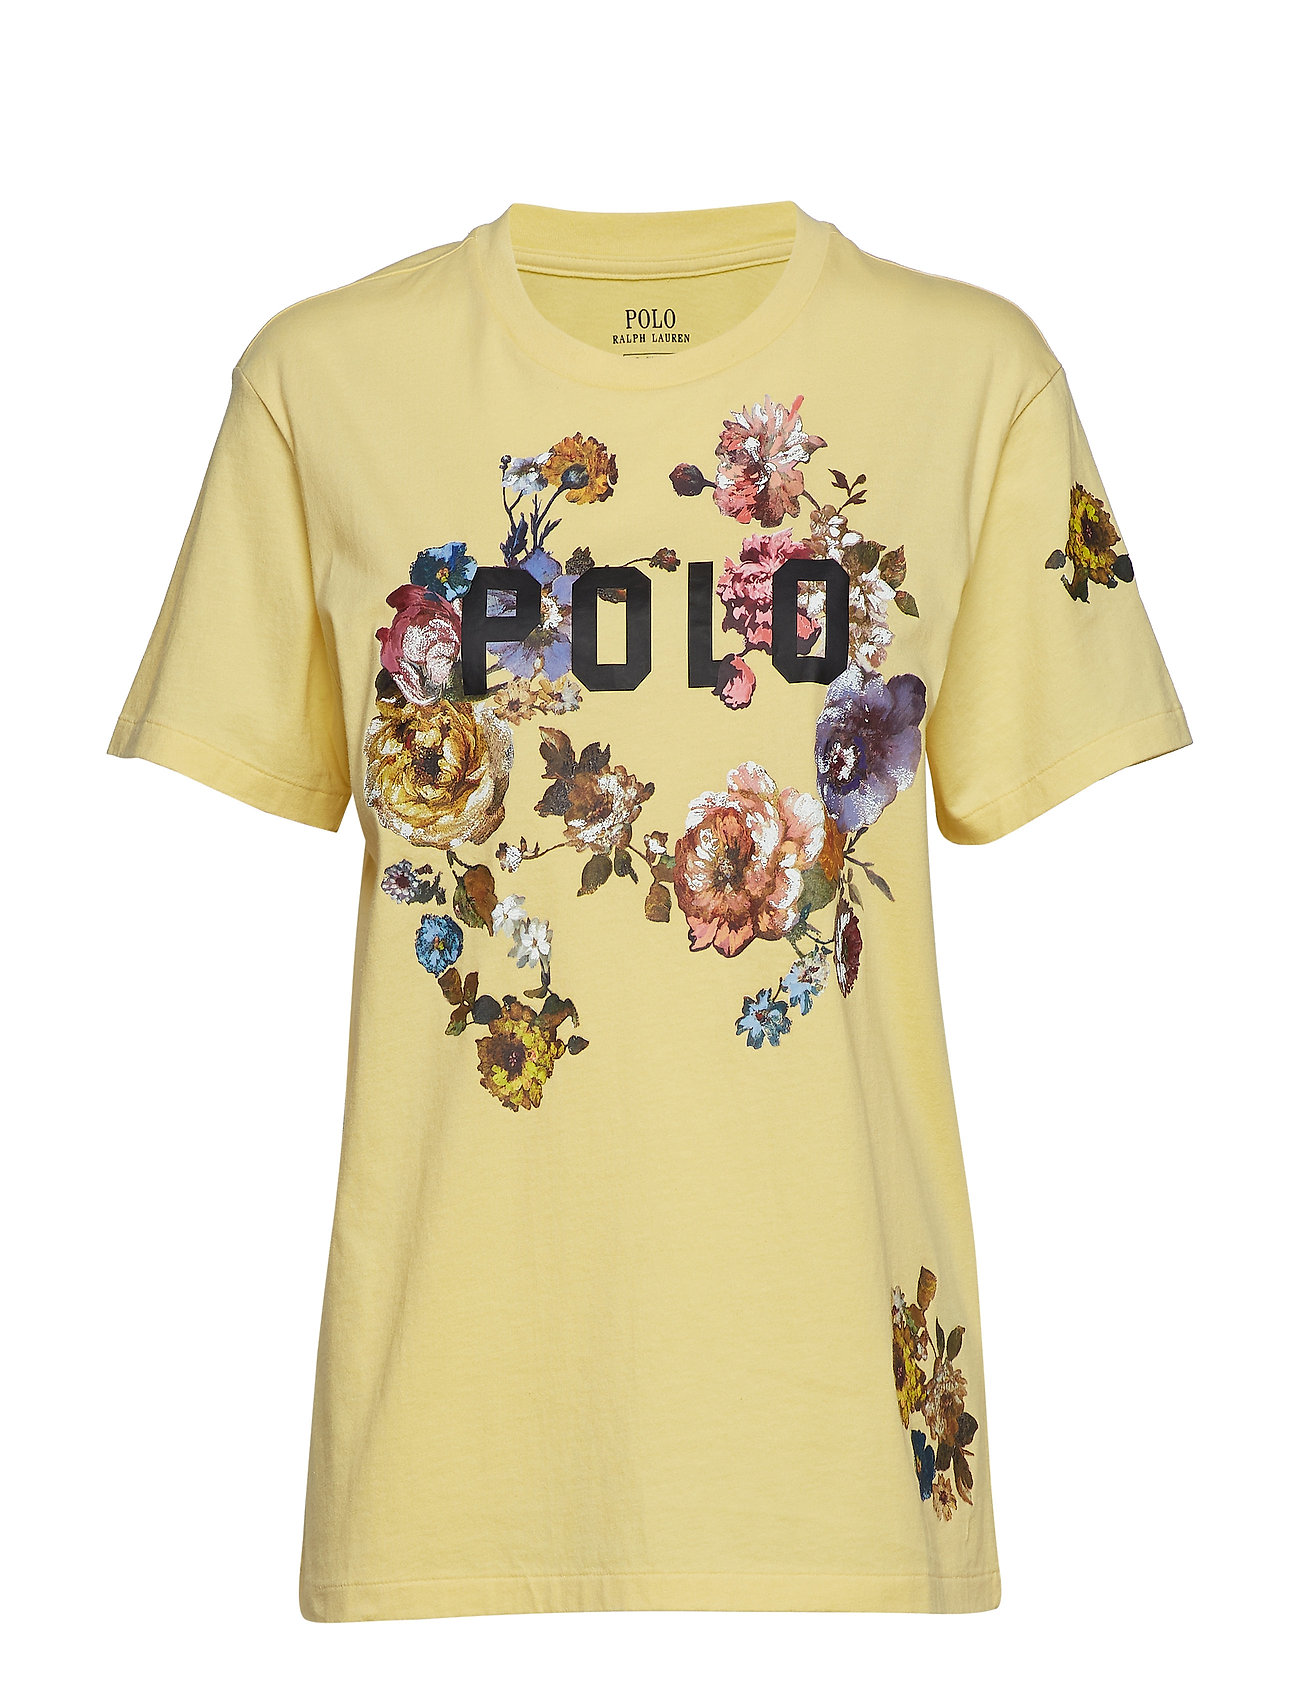 Polo Ralph Lauren Polo Floral Jersey Tee